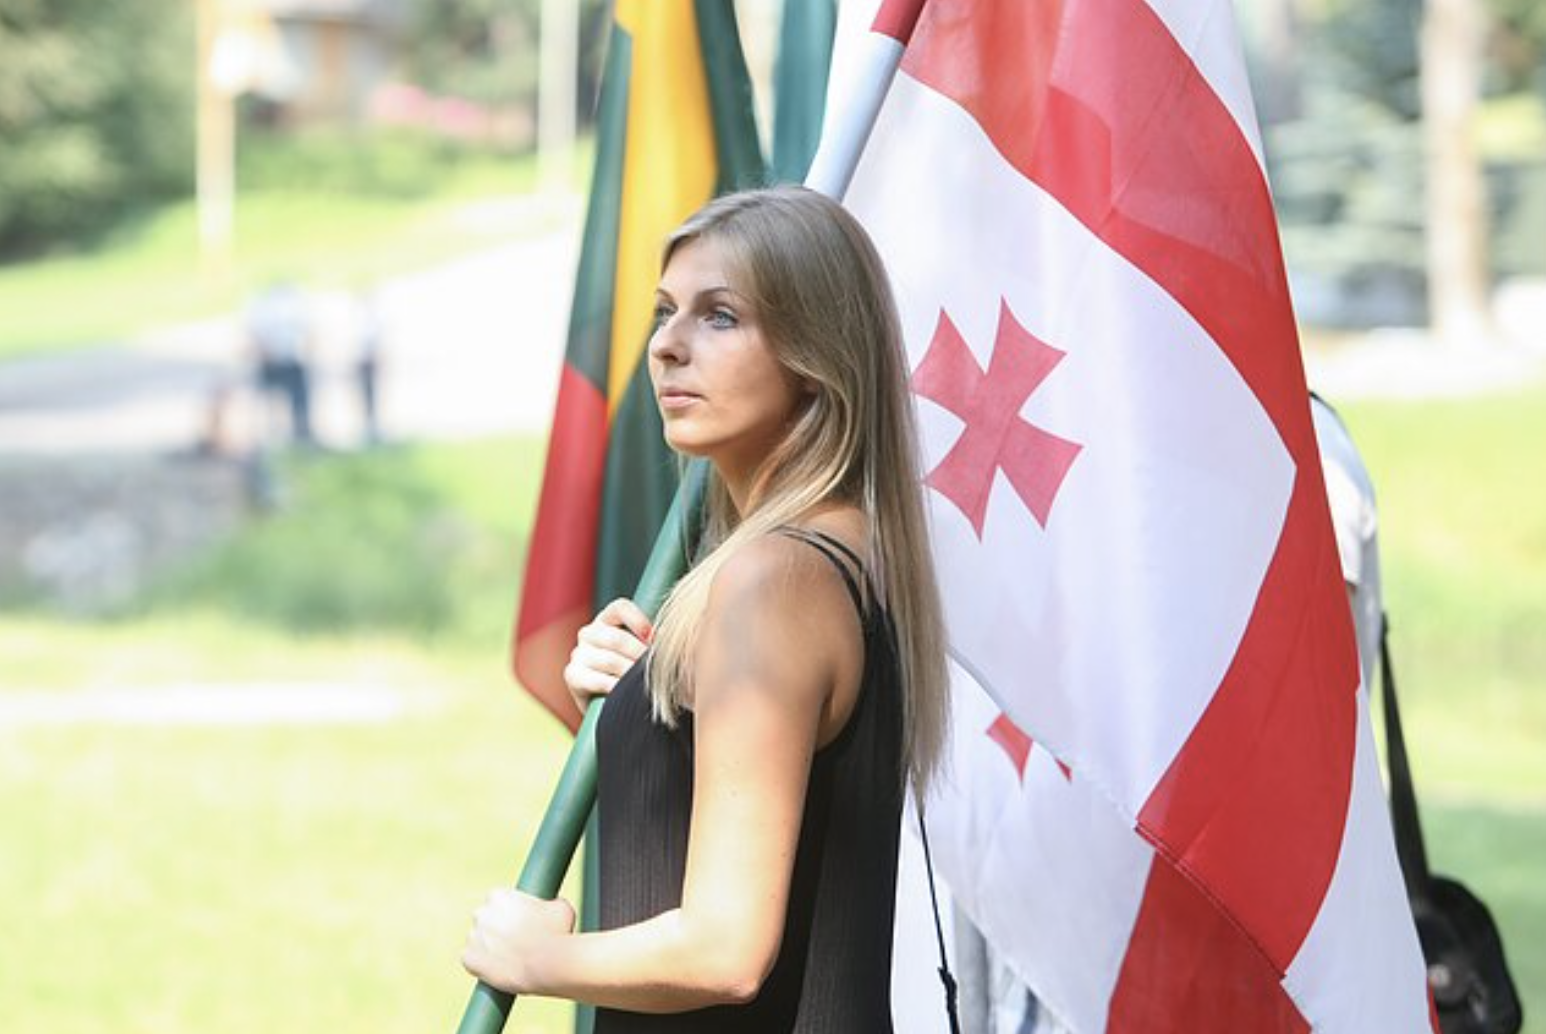 Lithuania Approves Sakartvelo as Official Name for Georgia